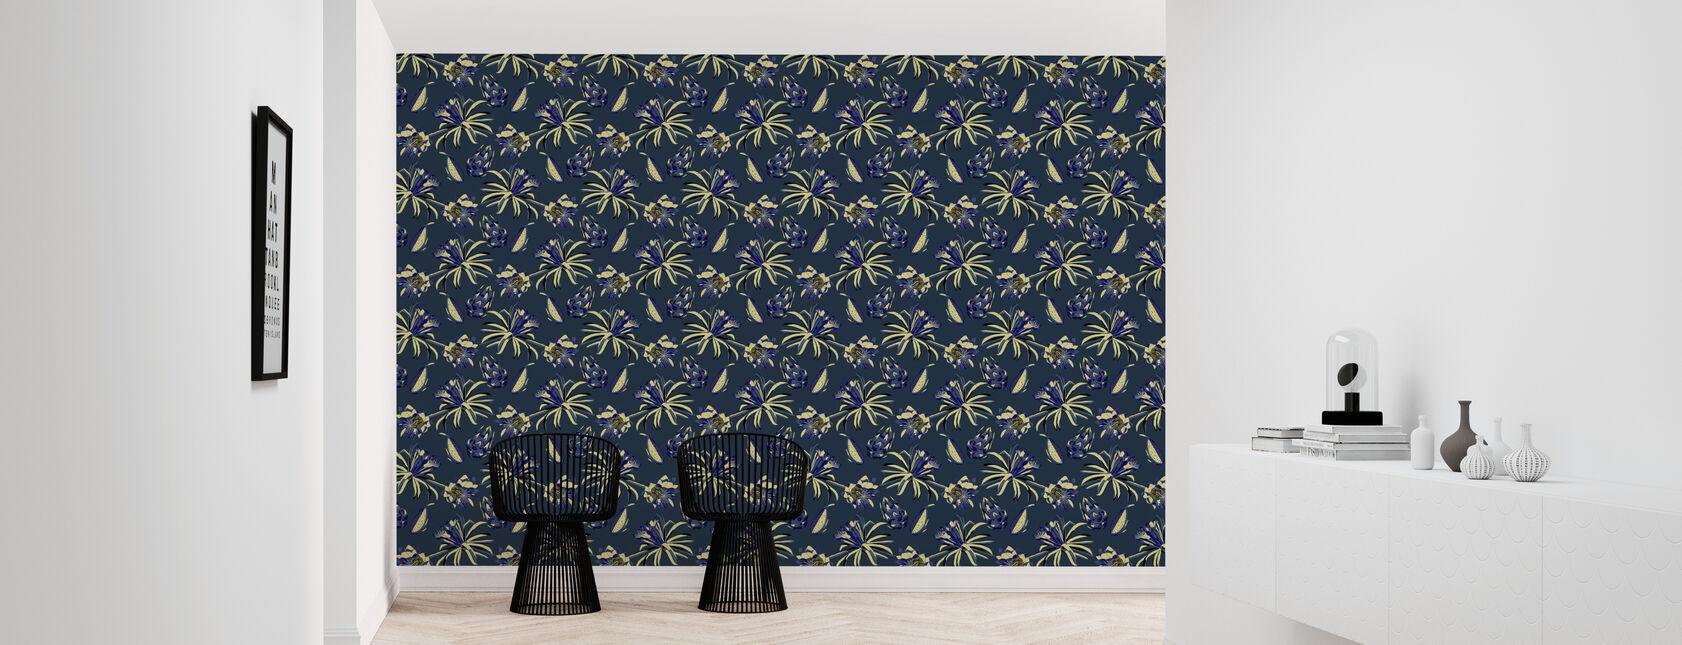 Dragon Fruit - Ultramarine - Wallpaper - Hallway